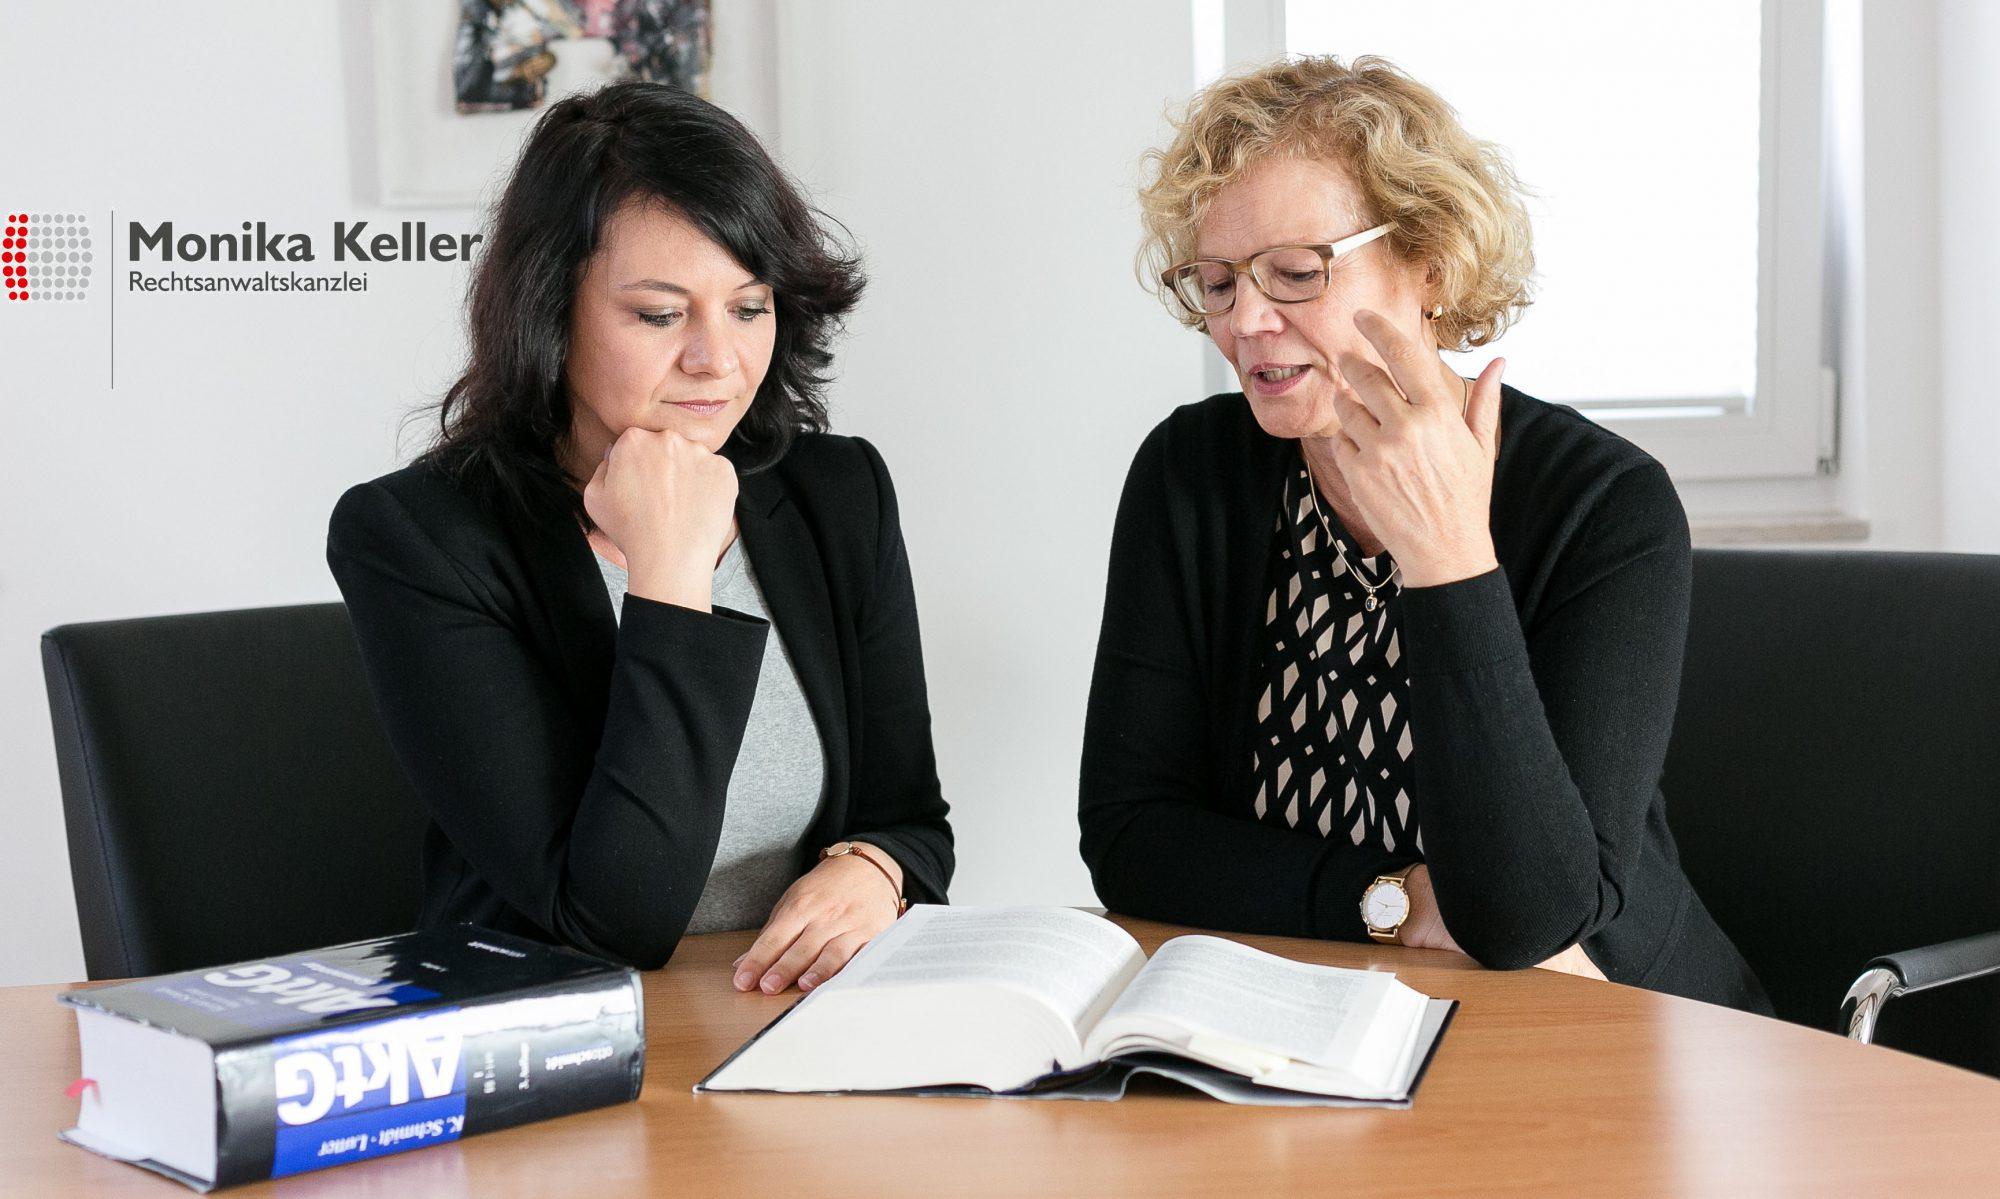 Monika Keller Rechtsanwaltskanzlei